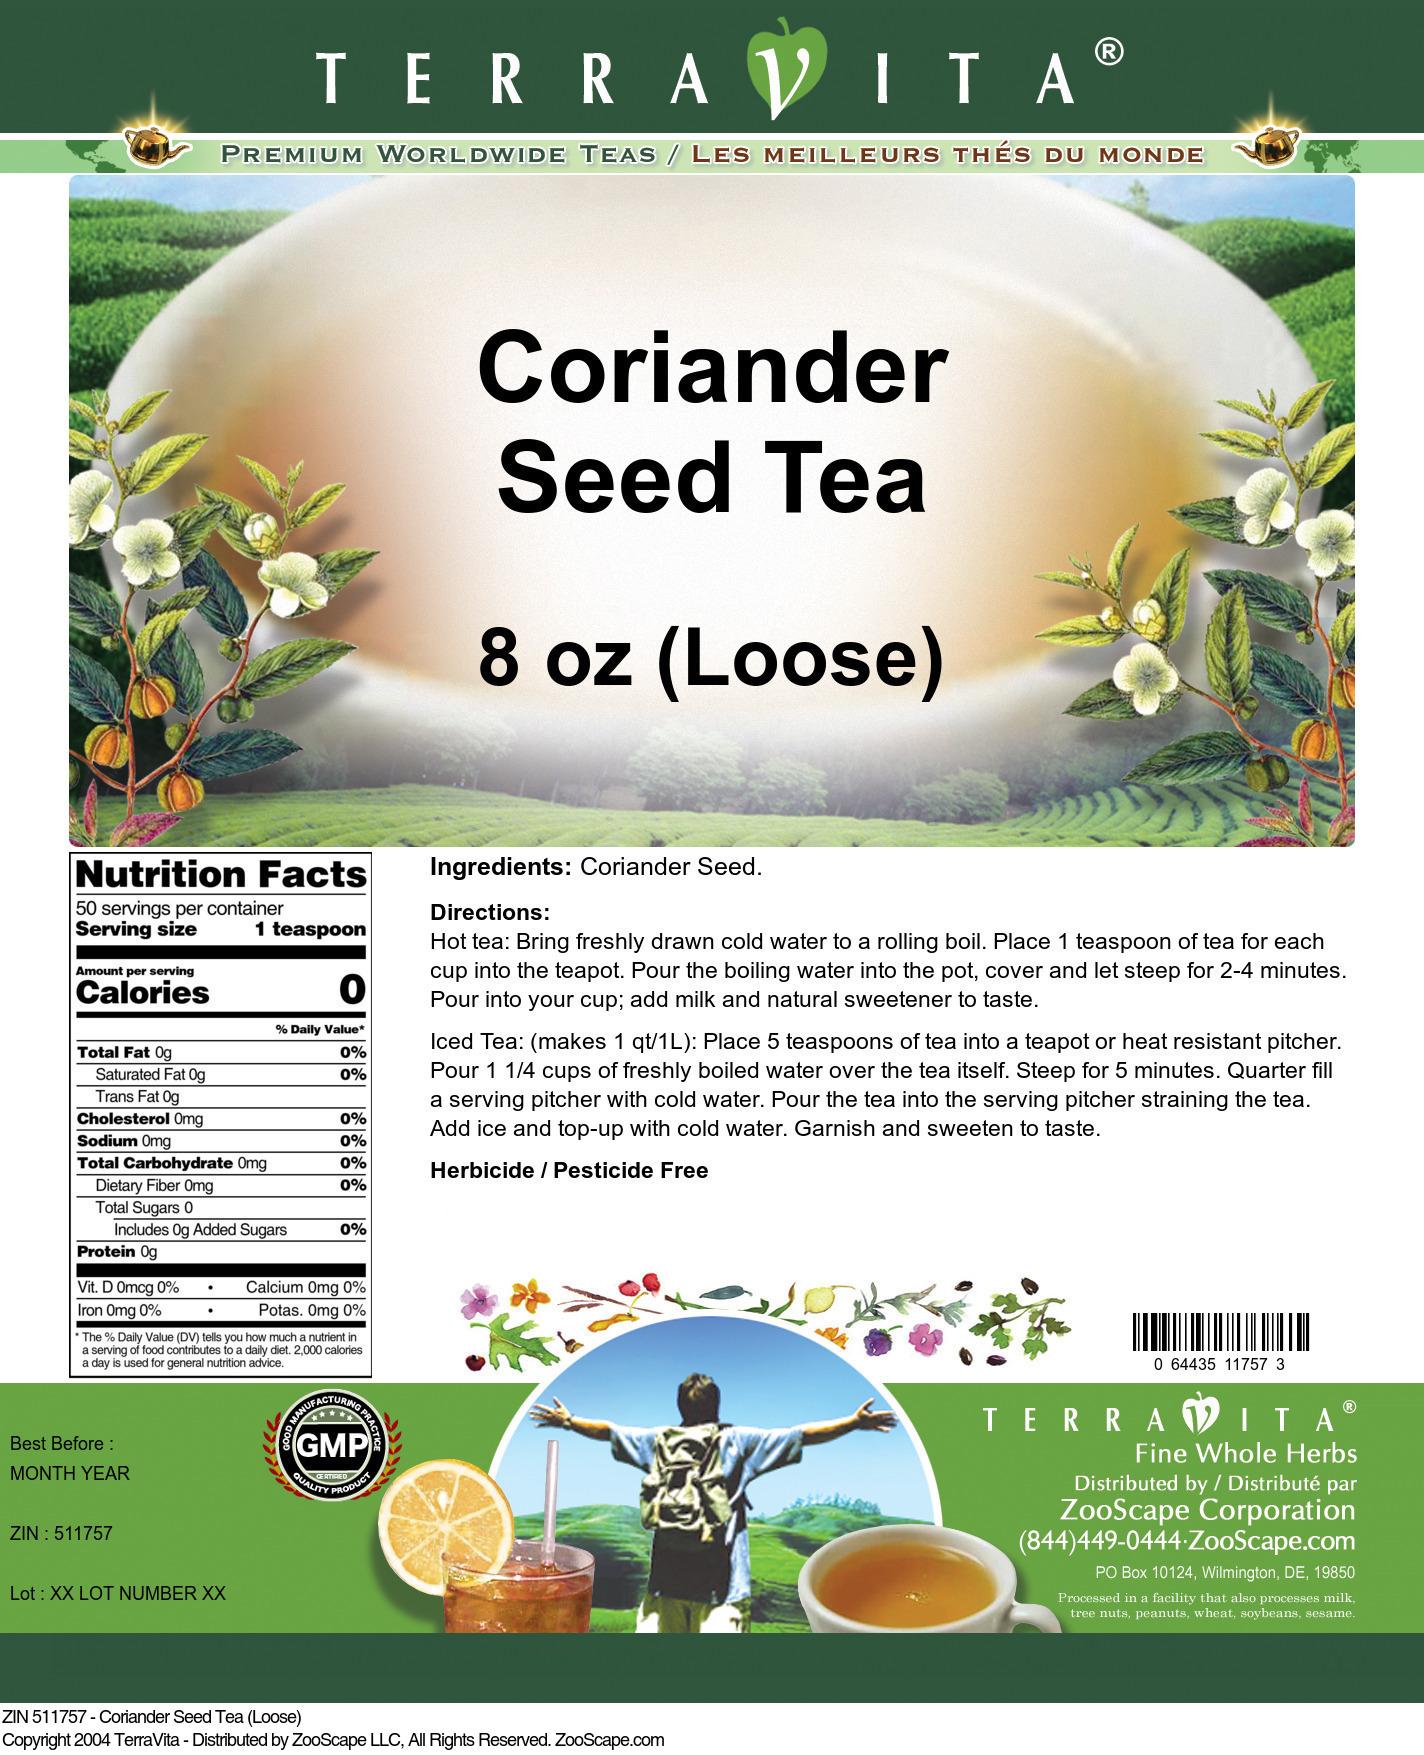 Coriander Seed Tea (Loose)